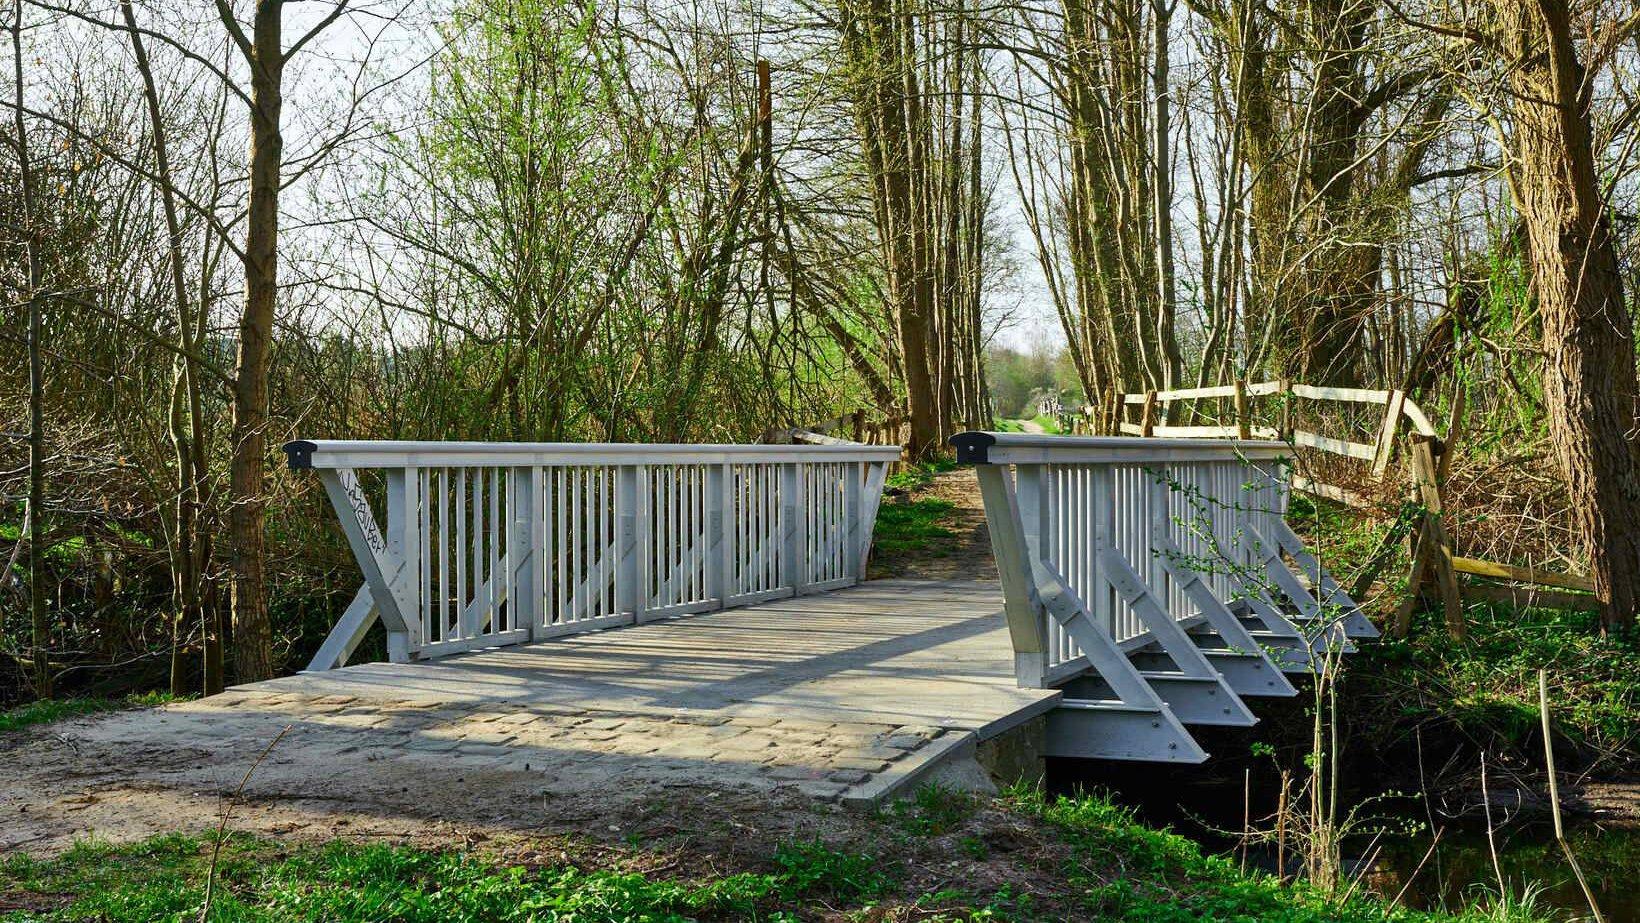 Gallery image 0 - footbridge in a public park